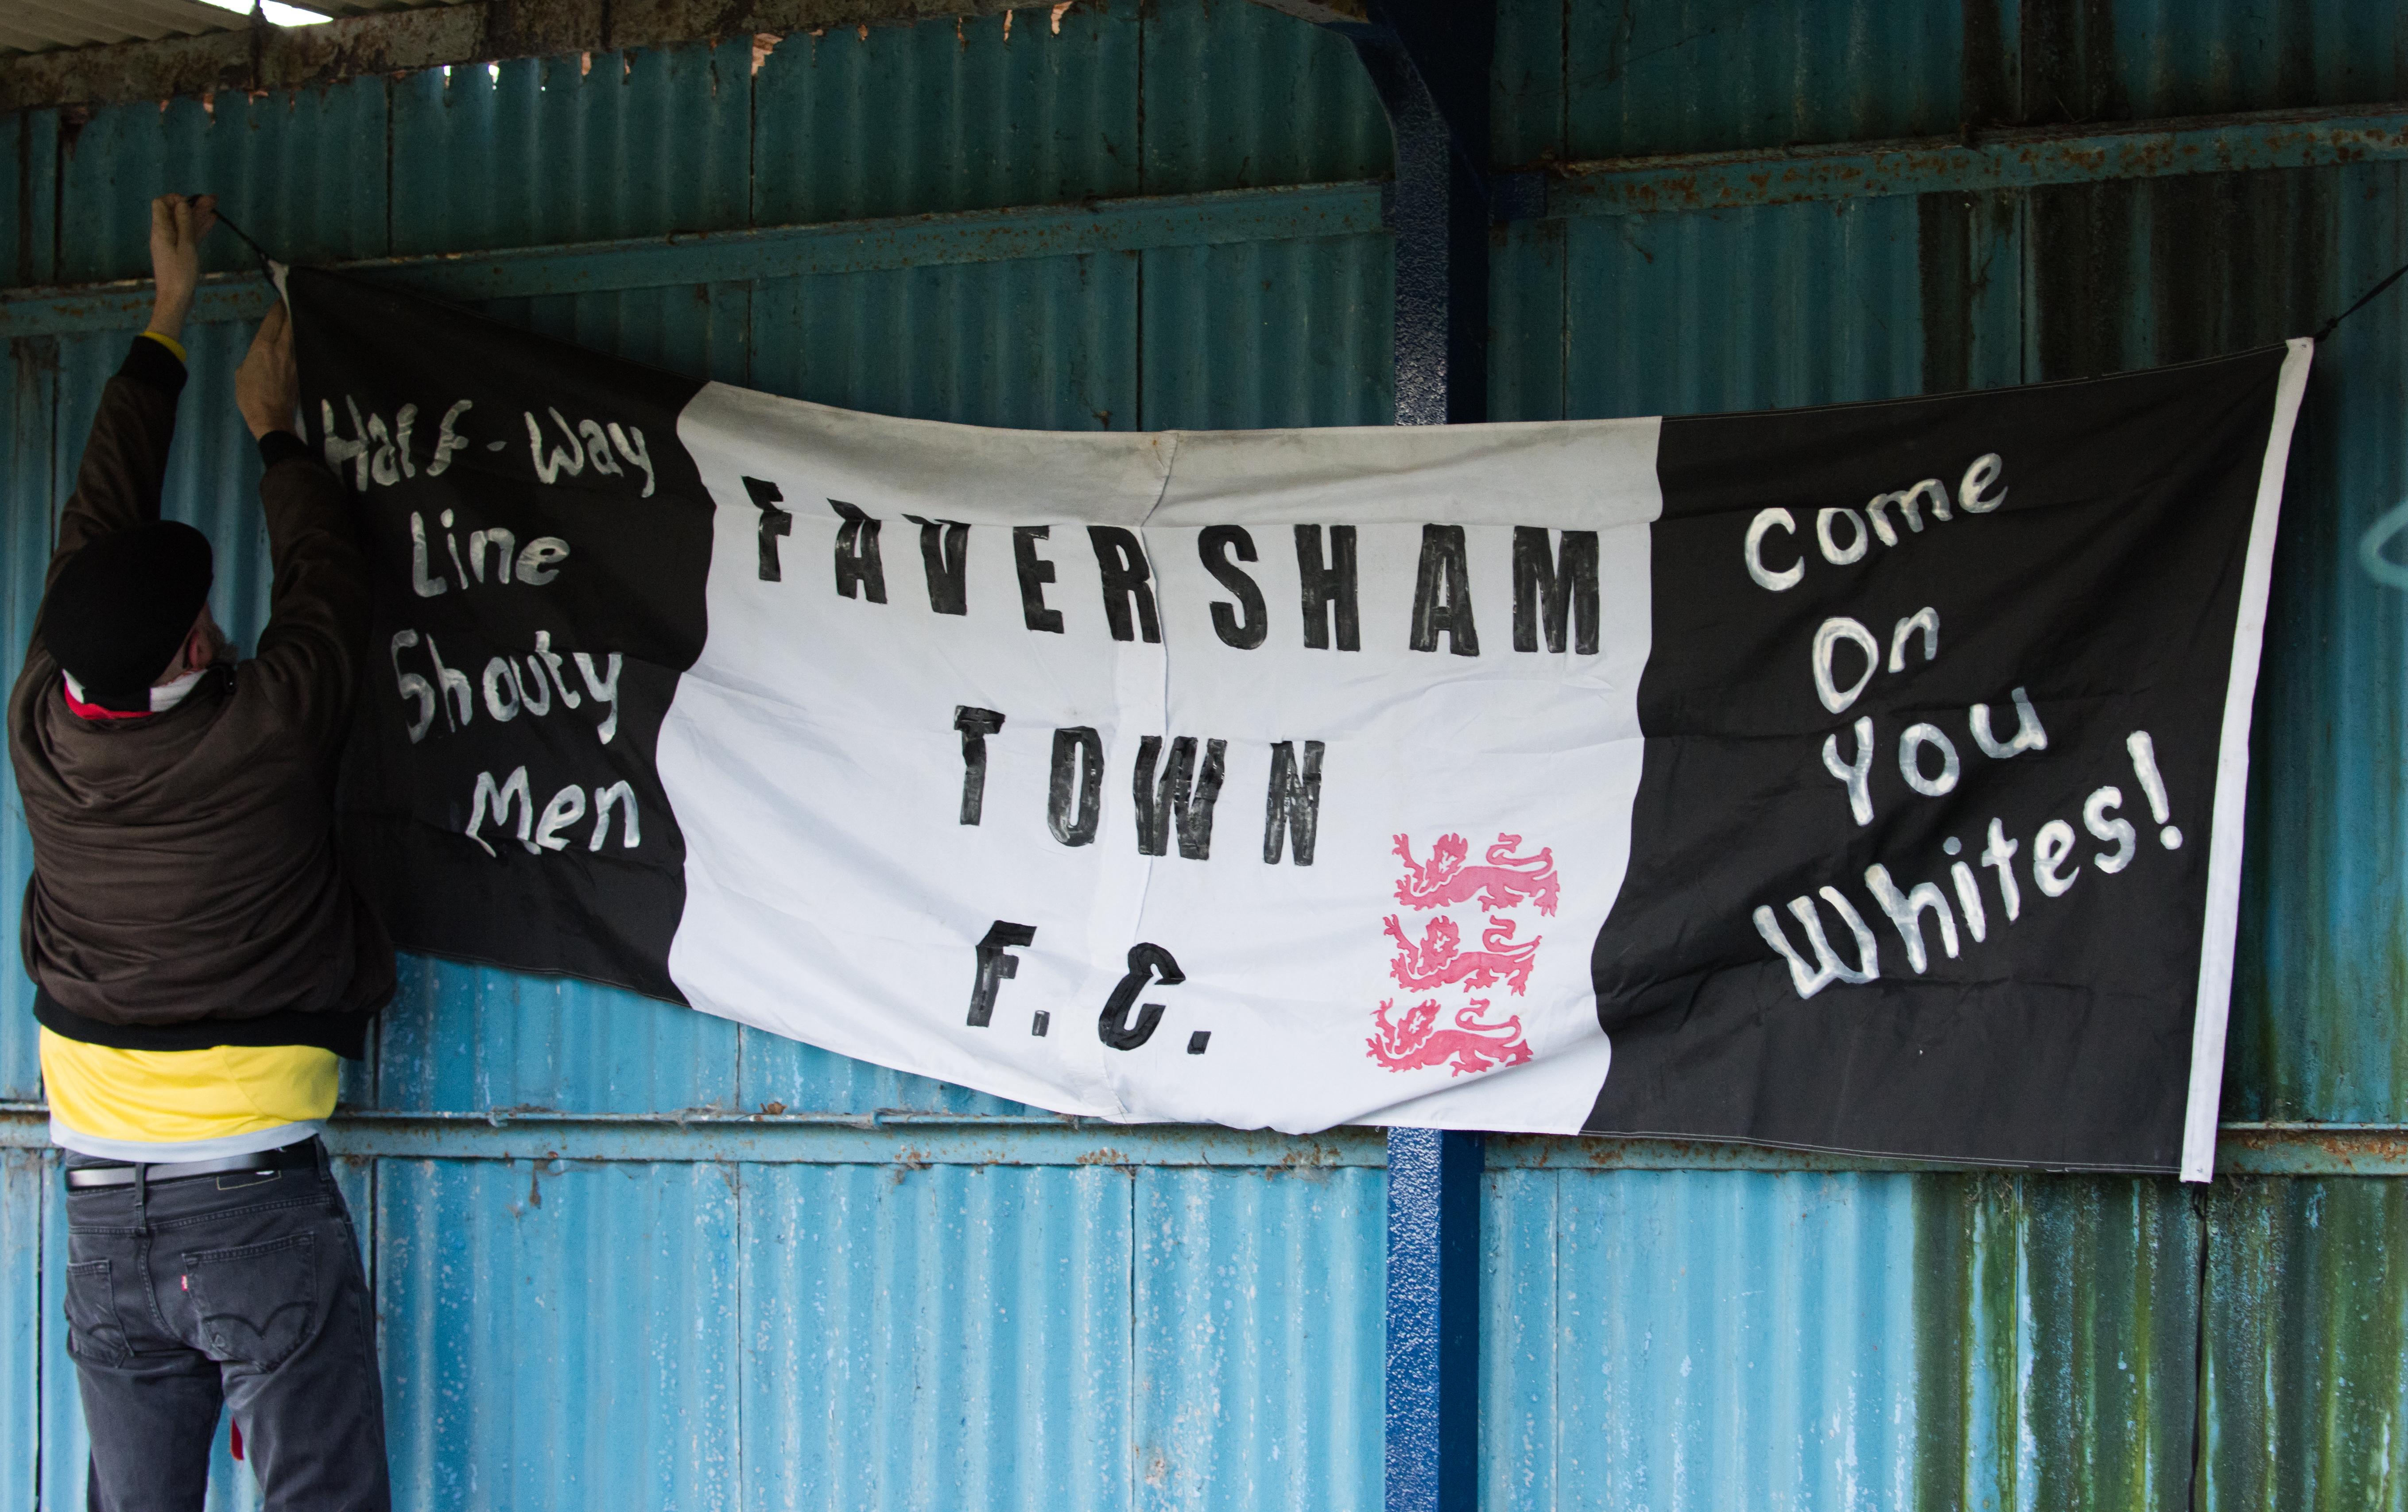 Shoreham FC vs Faversham Town 16.12.17 19